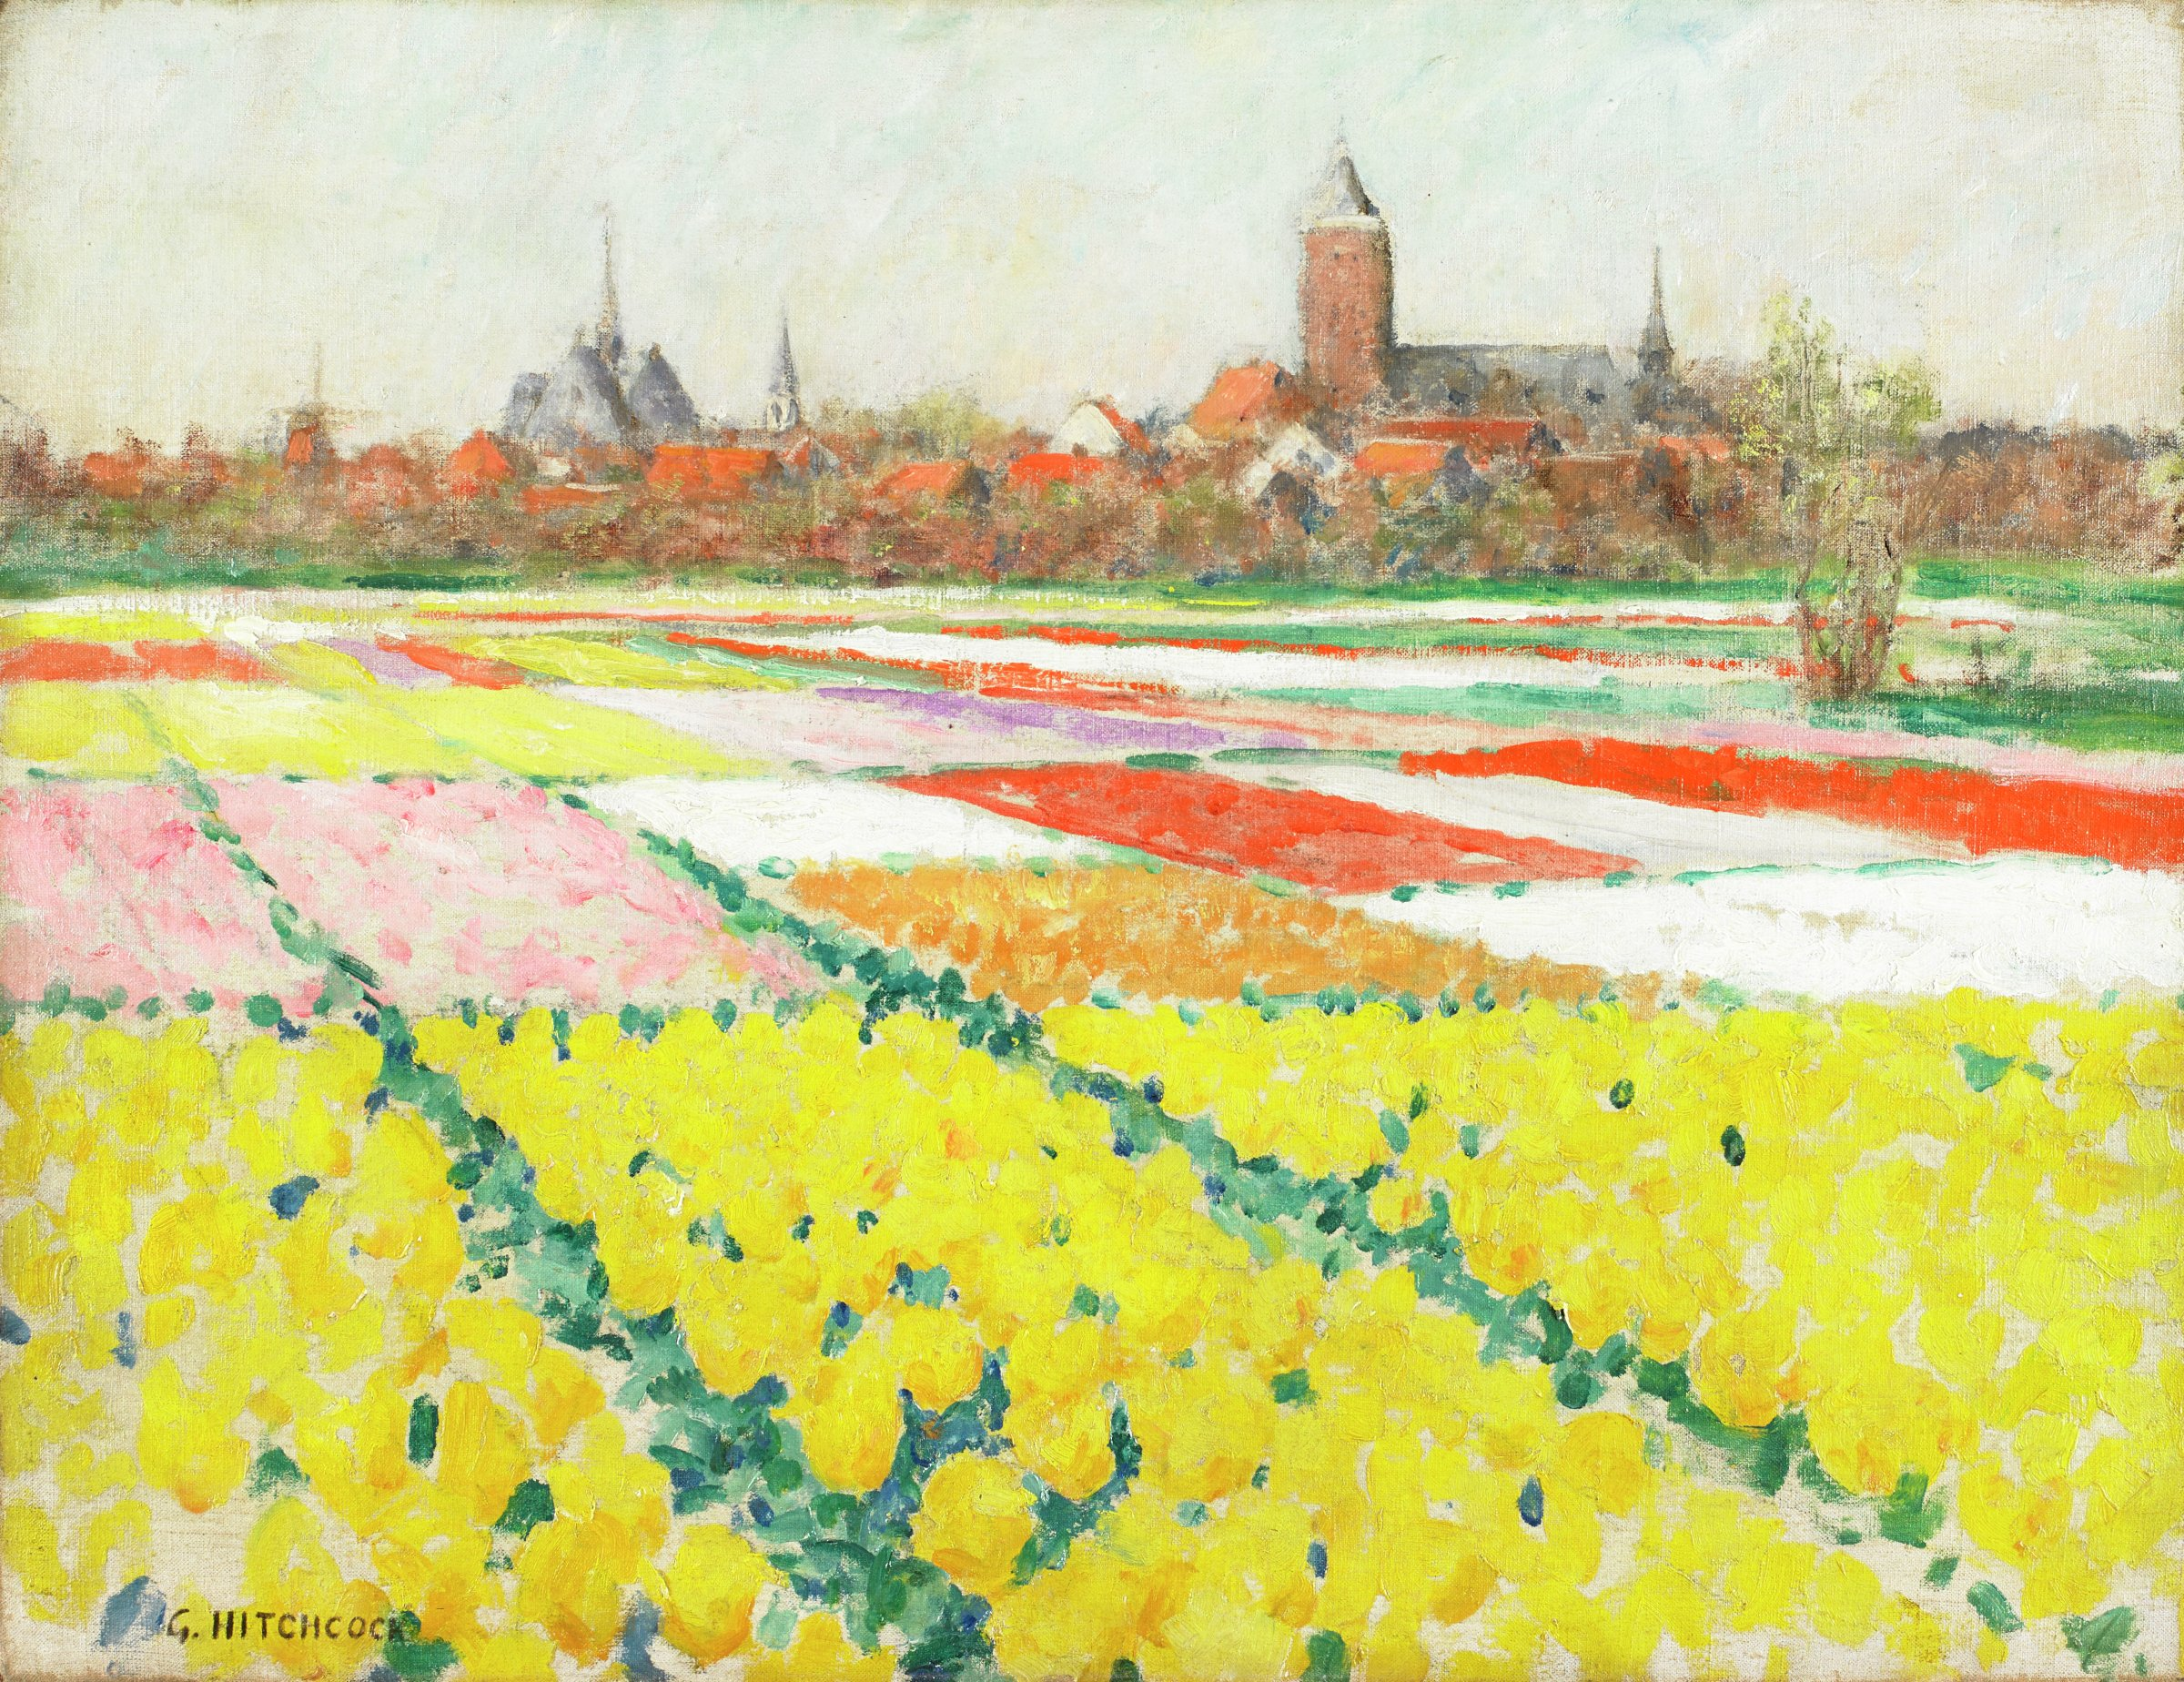 Tulip Field Near Leiden, George Hitchcock, oil on canvas